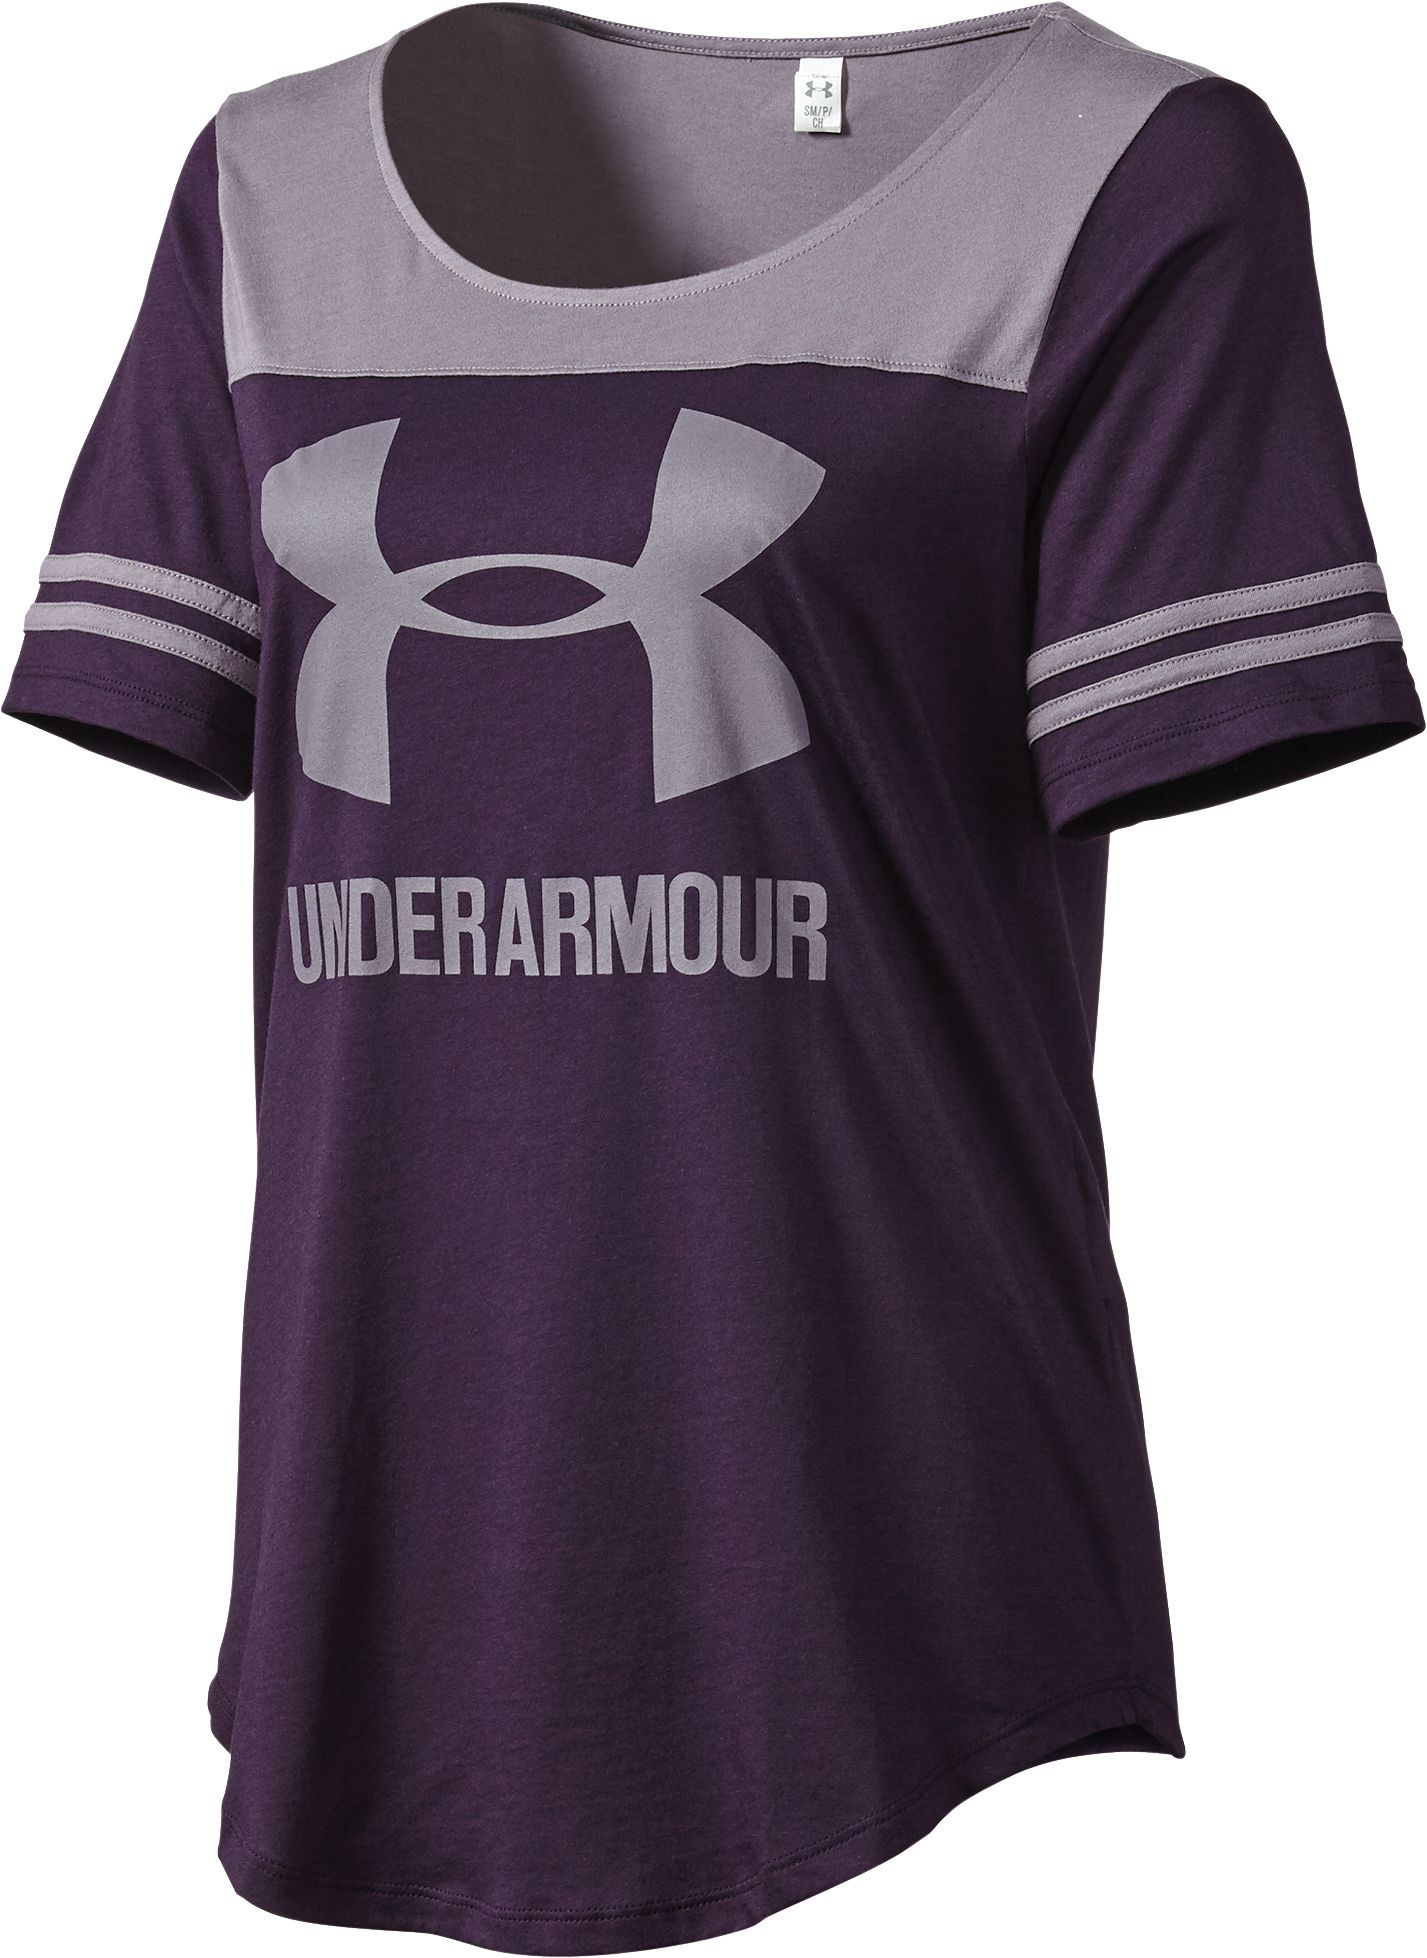 Under armour womens sportstyle baseball t shirt dicks for Bulk under armour shirts